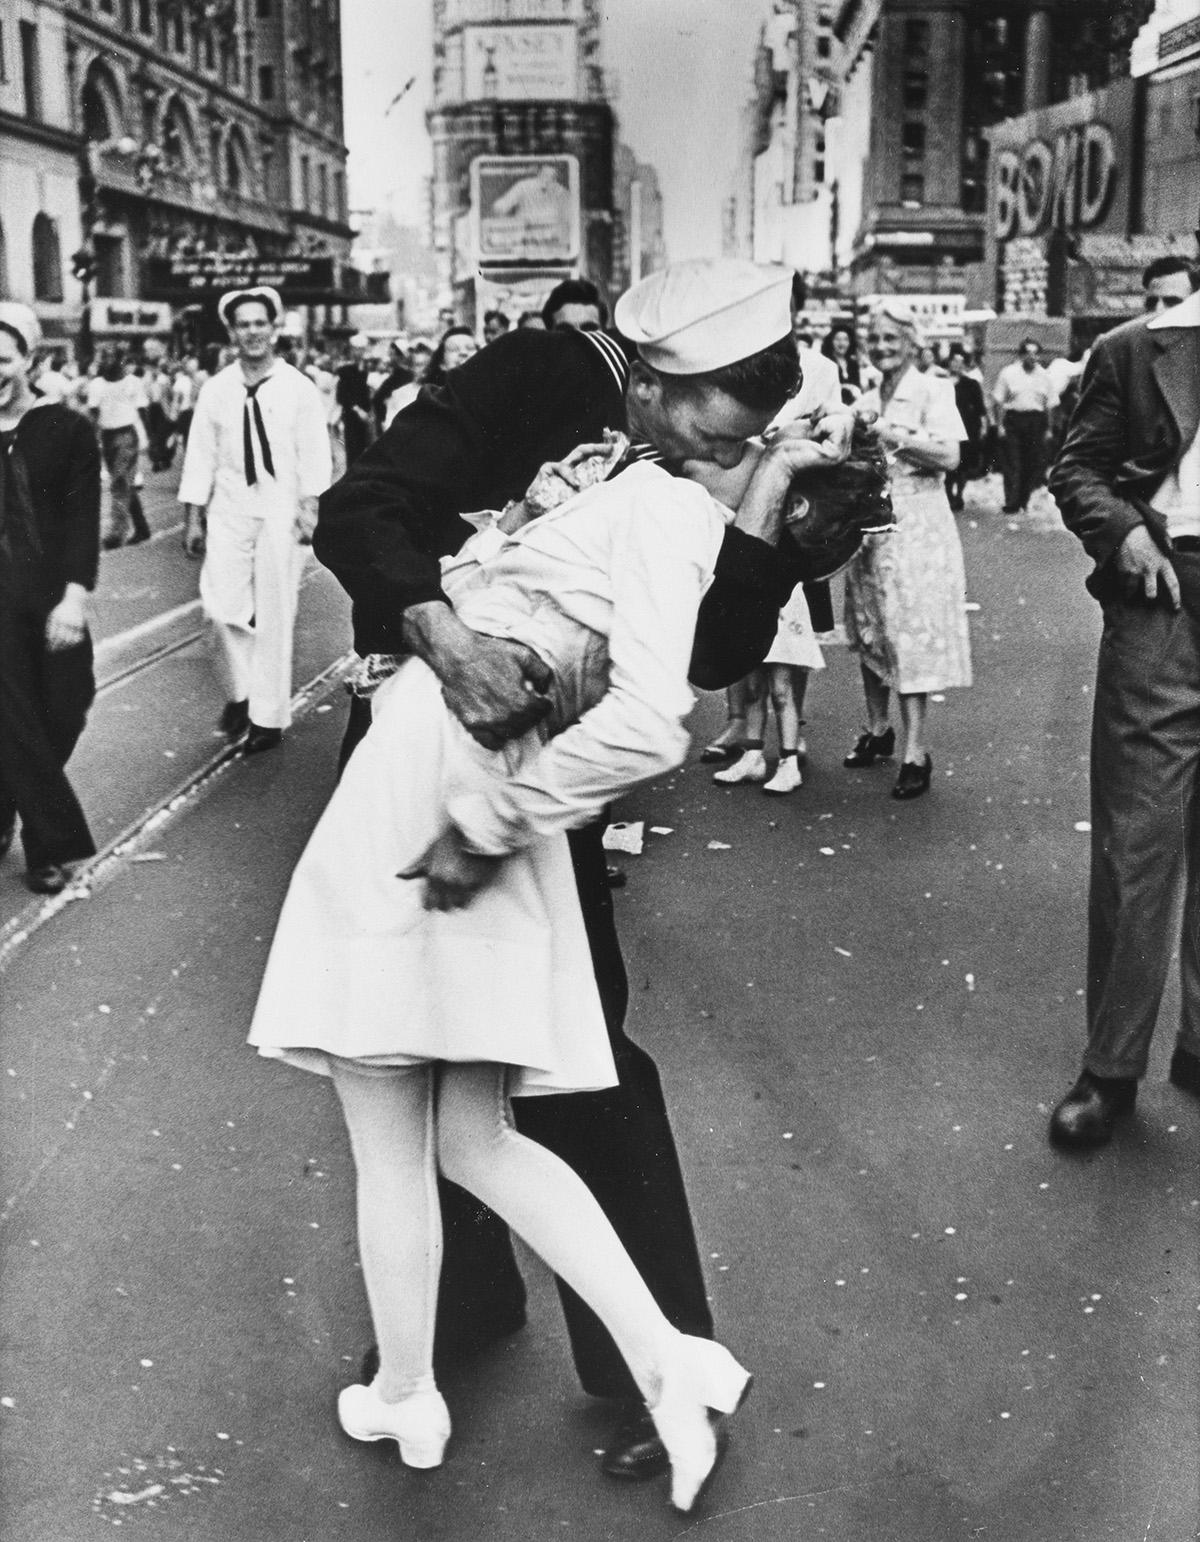 ALFRED EISENSTAEDT (1898-1995) V-J Day Kiss, Times Square, New York.